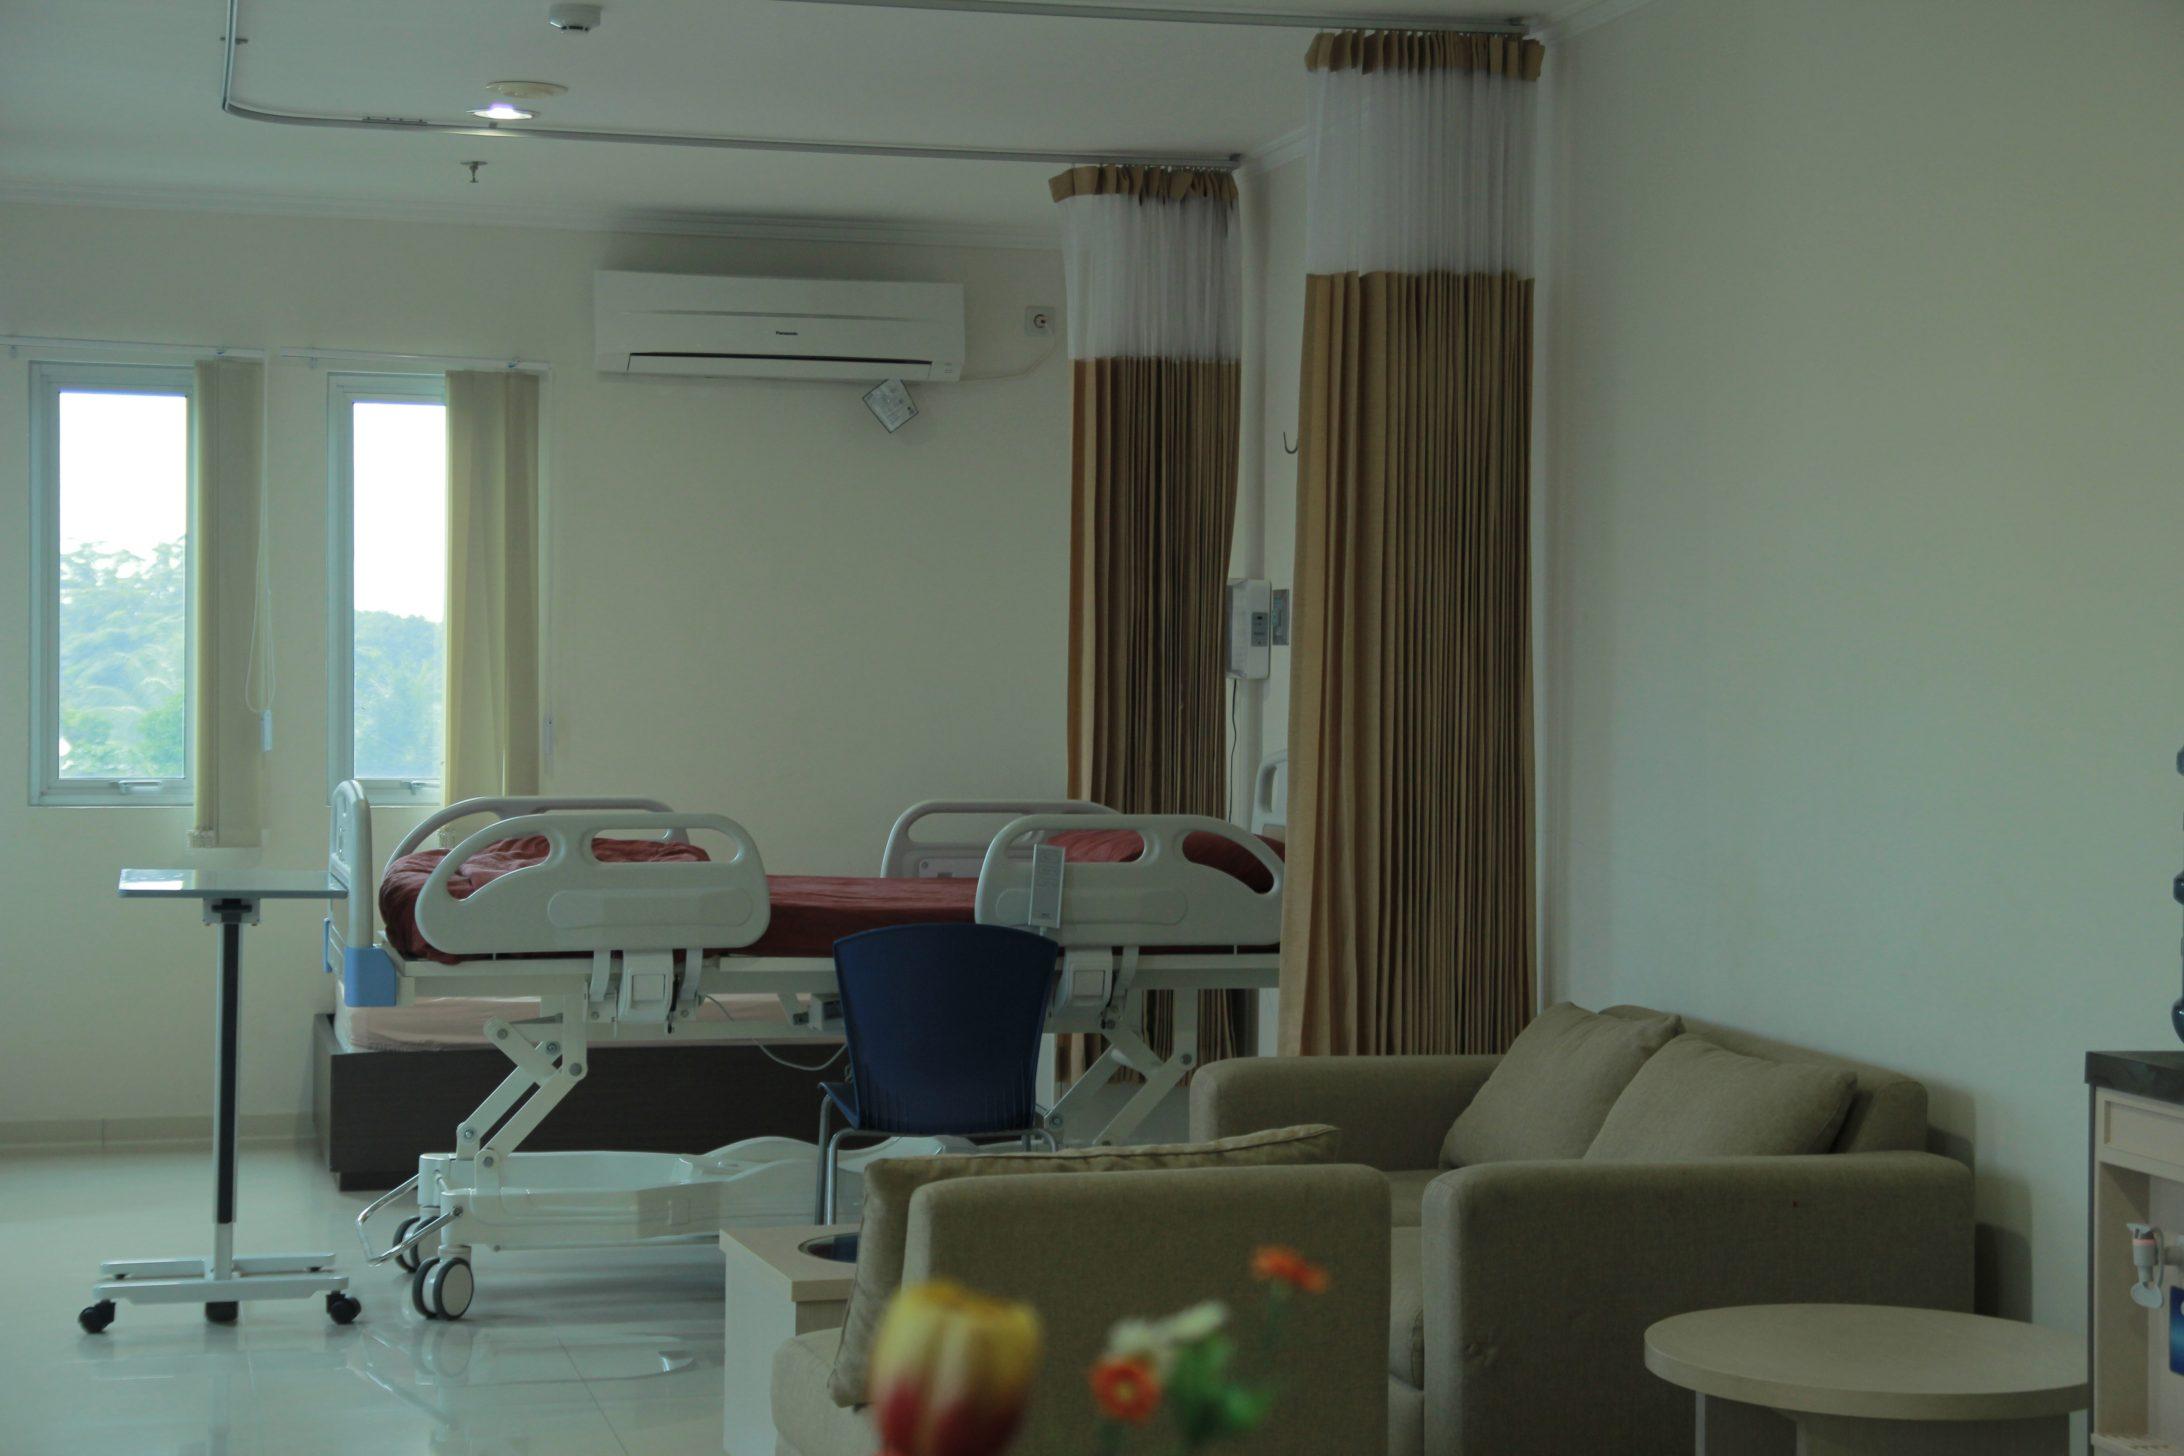 gorden rumah sakit permata pamulang